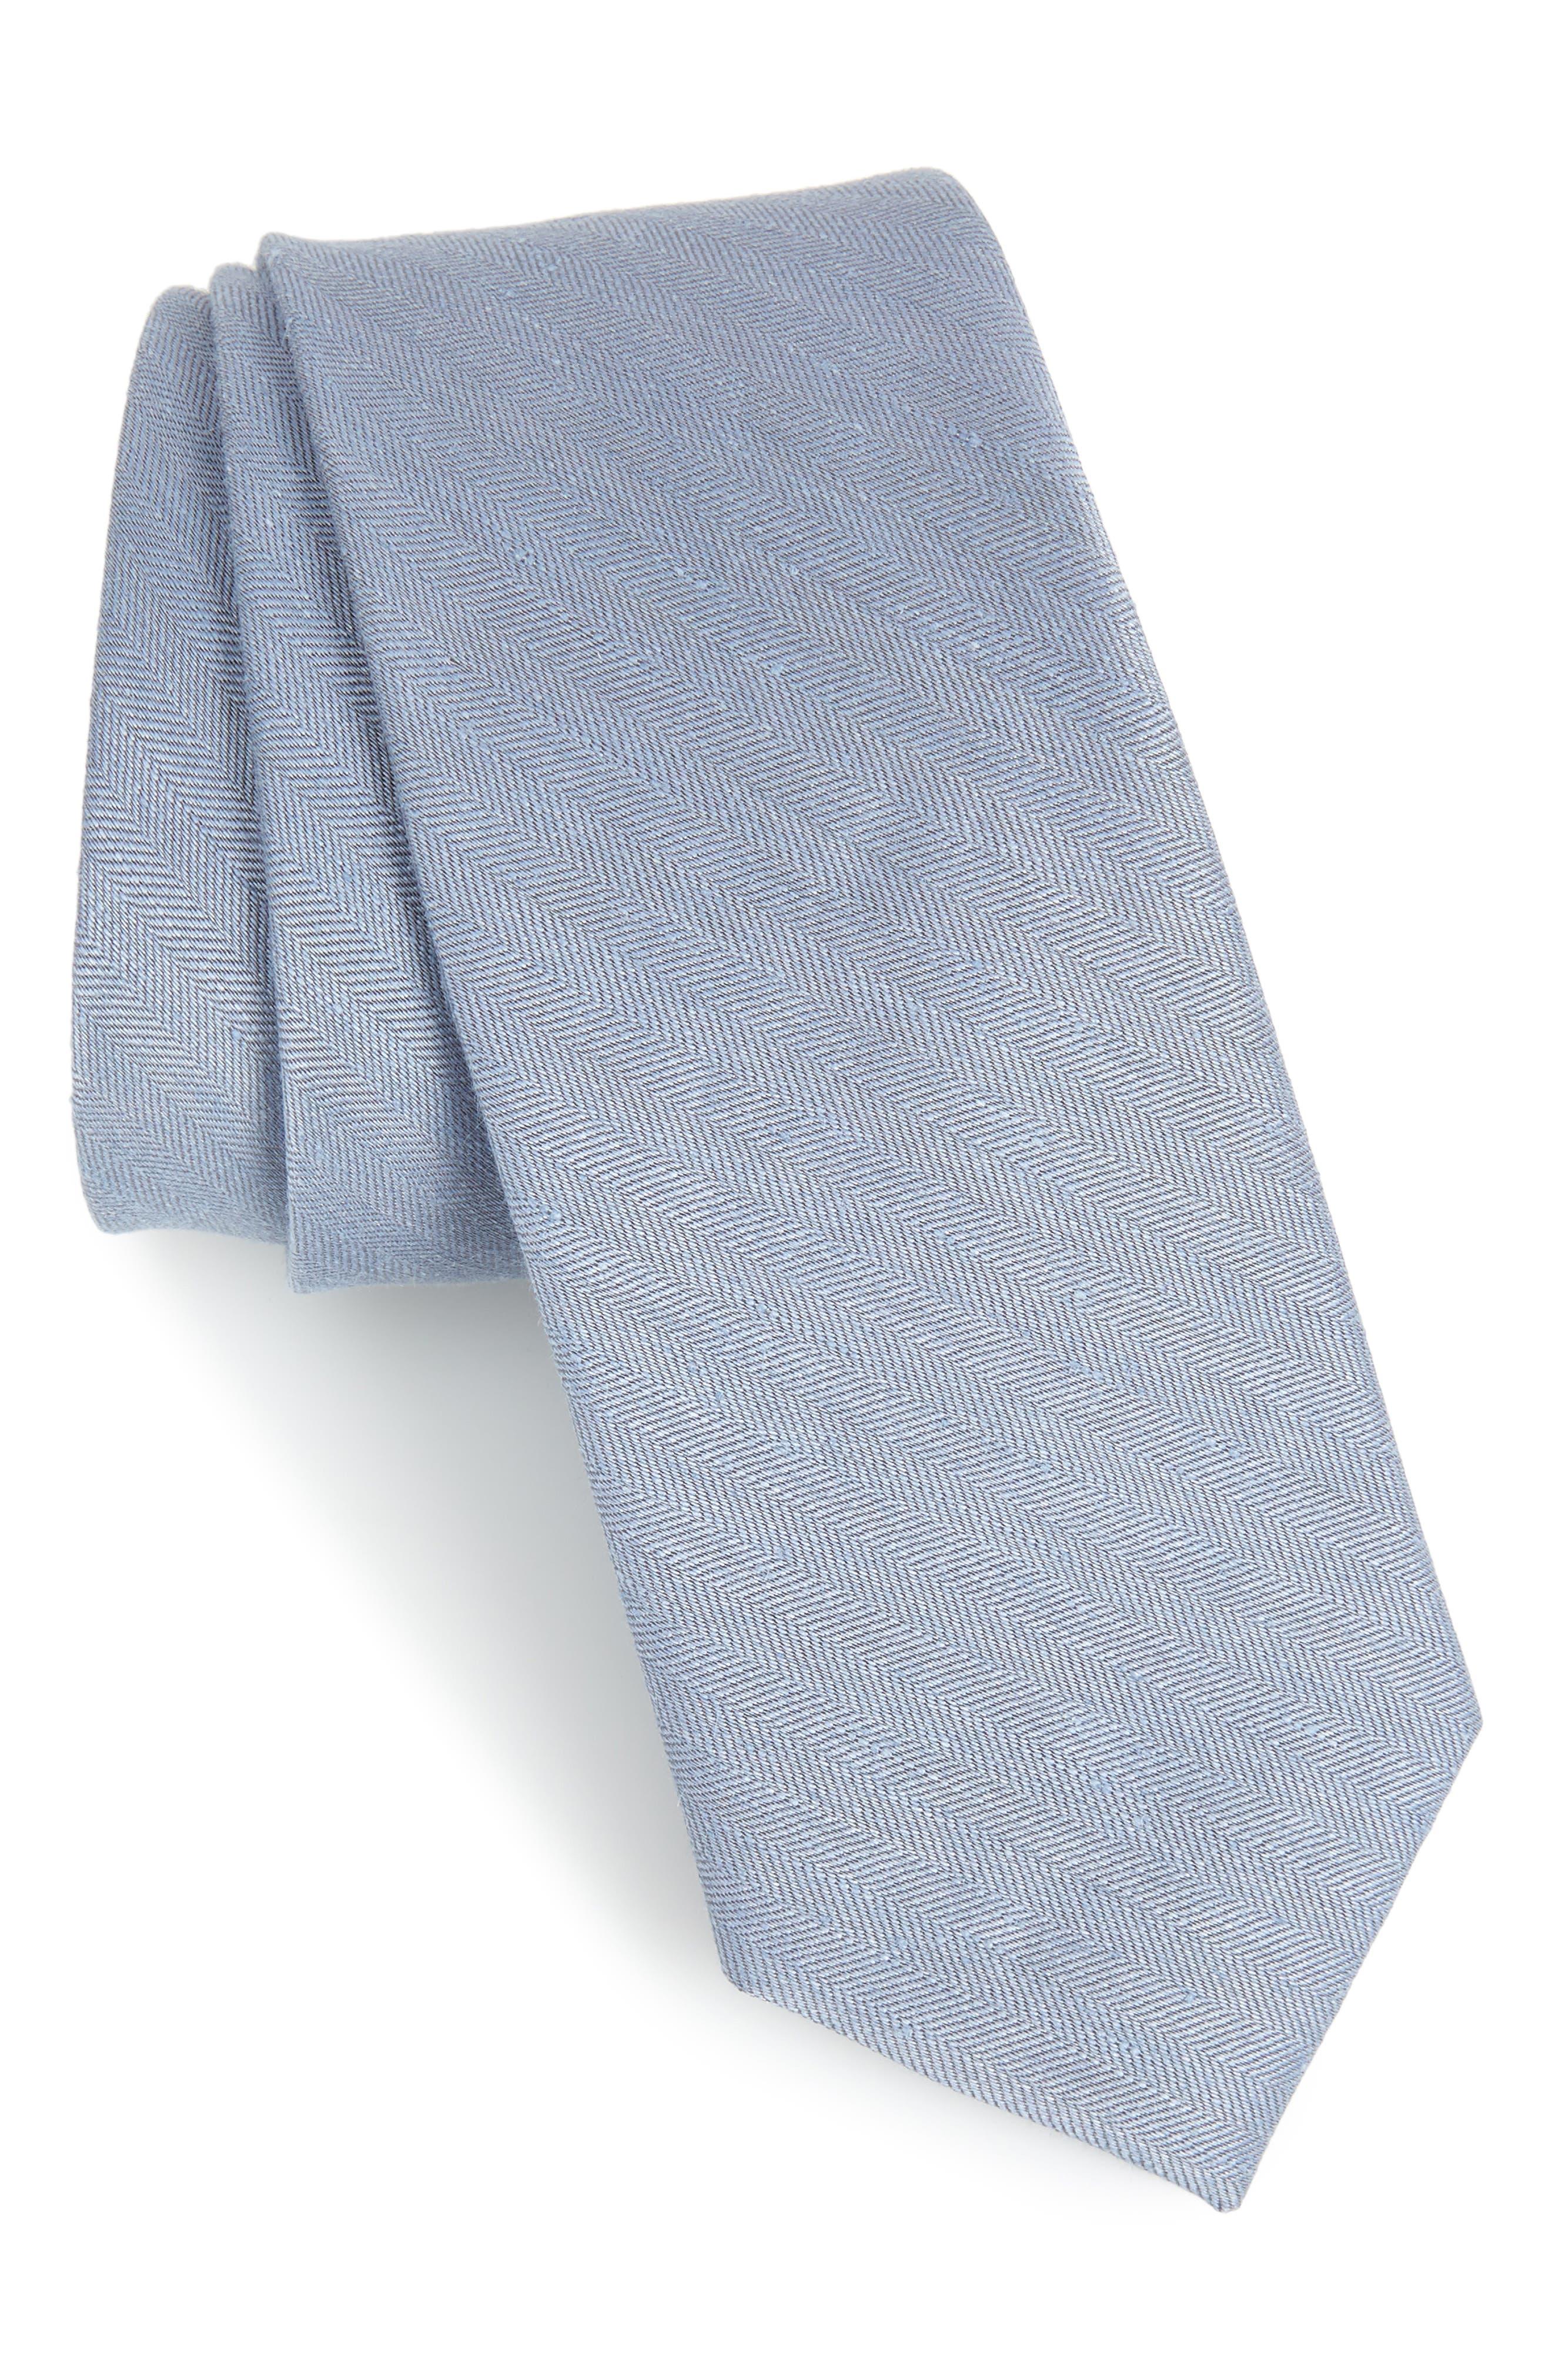 THE TIE BAR, Herringbone Linen & Silk Skinny Tie, Main thumbnail 1, color, SLATE